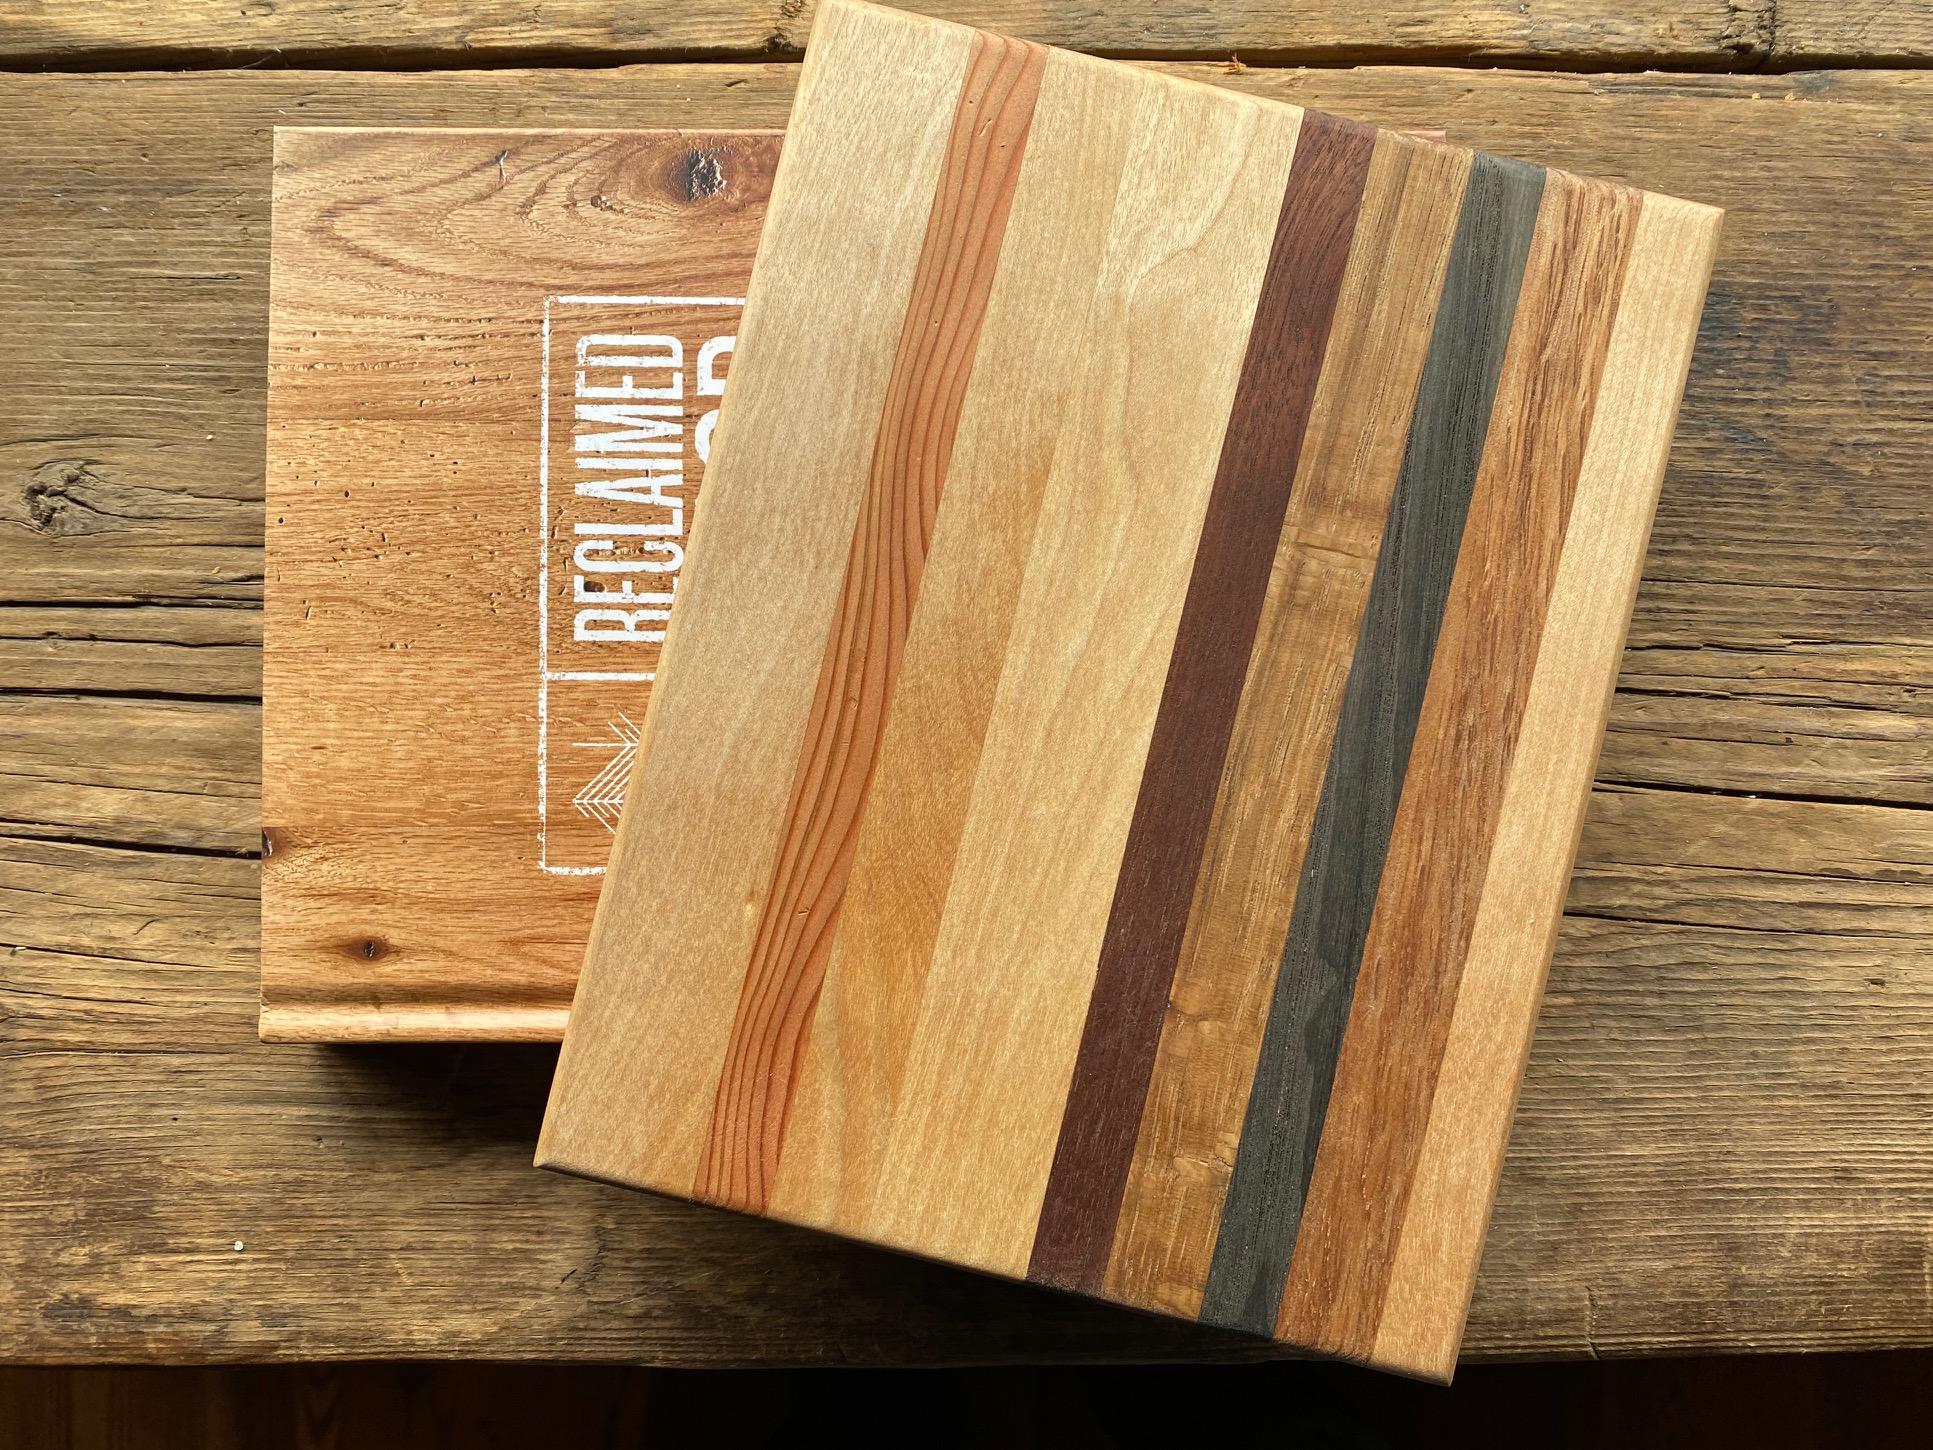 Woodworking Classes Brooklyn Nyc Woodshop Sawkill Lumber